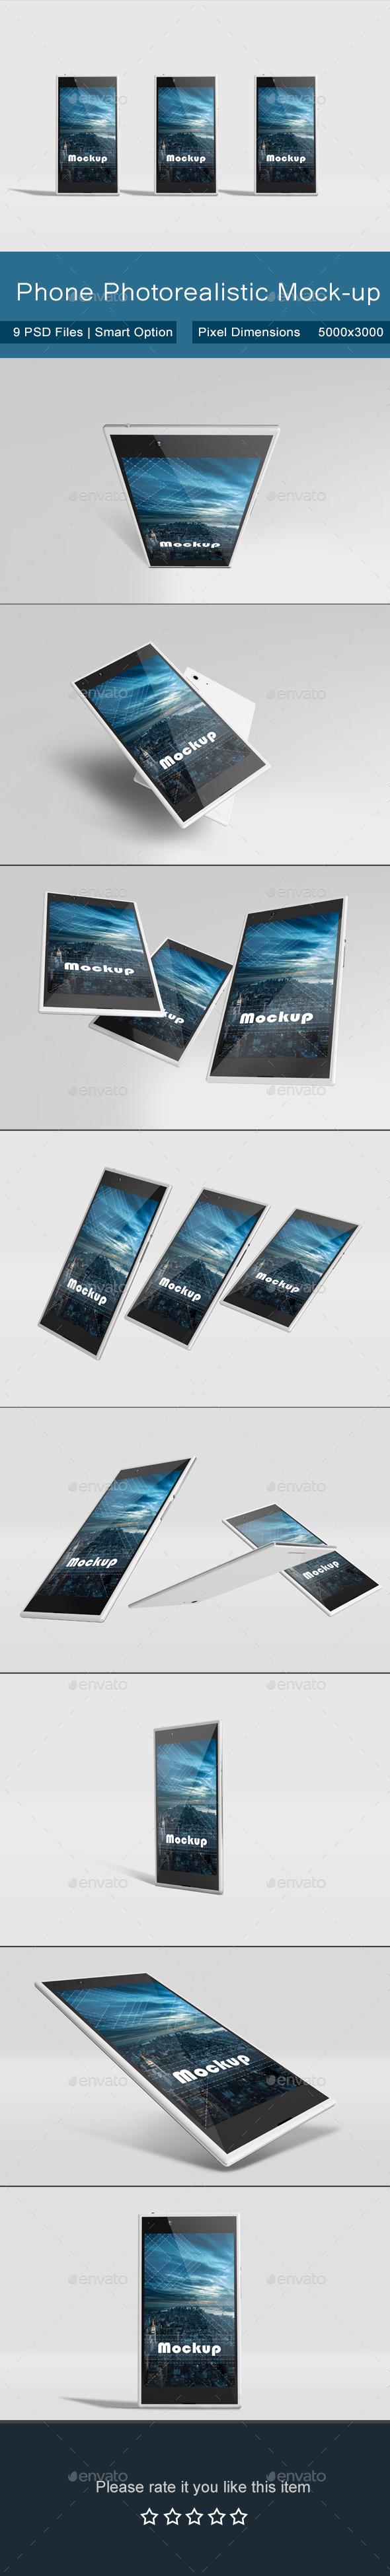 GraphicRiver Phone Photorealistic Mock-up 11288692